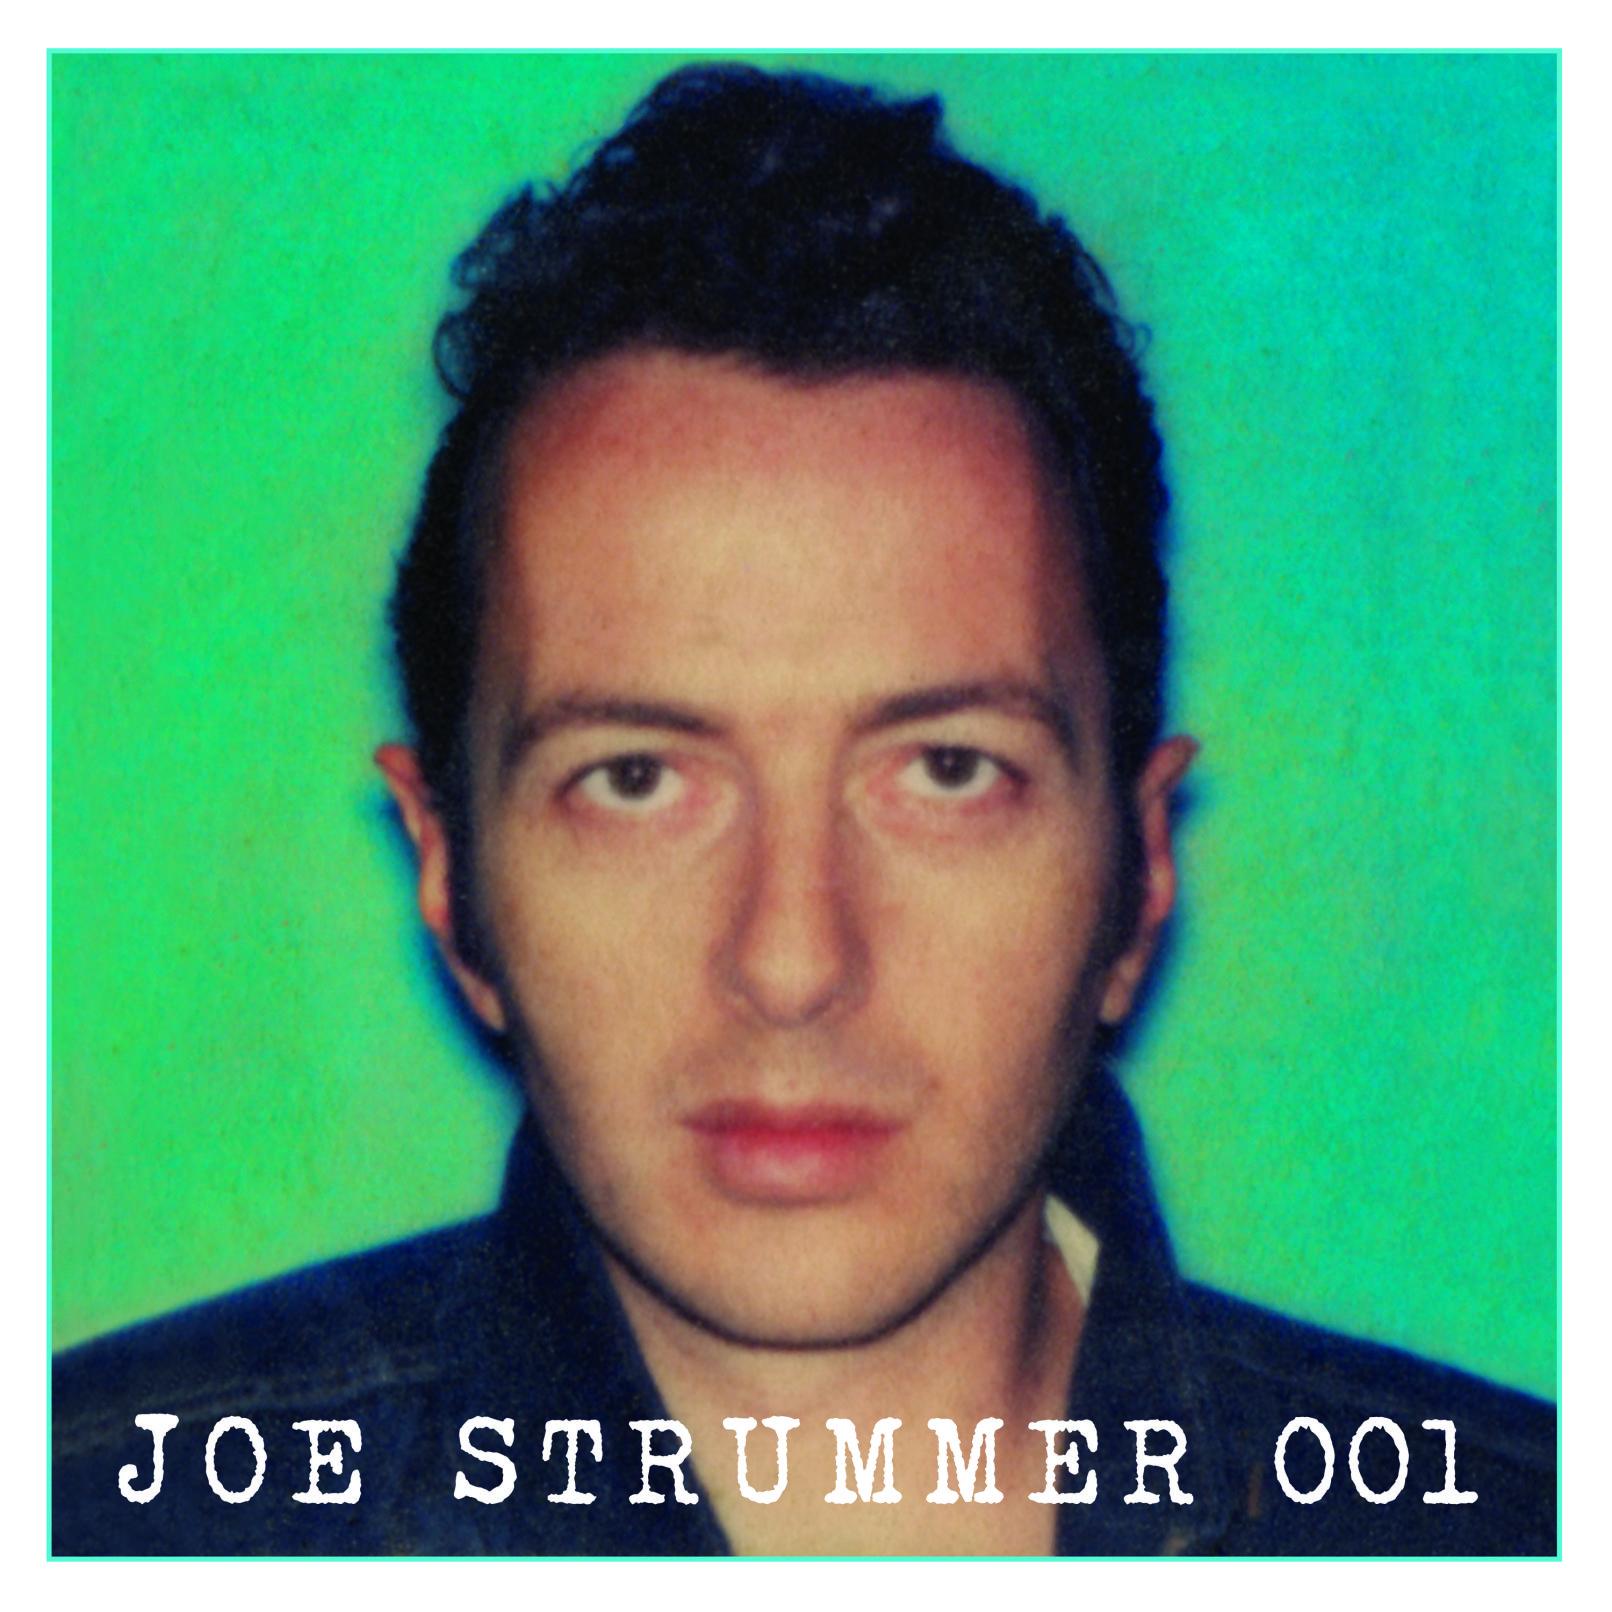 Joe Strummer 001 posthumous box set arrived: Stream